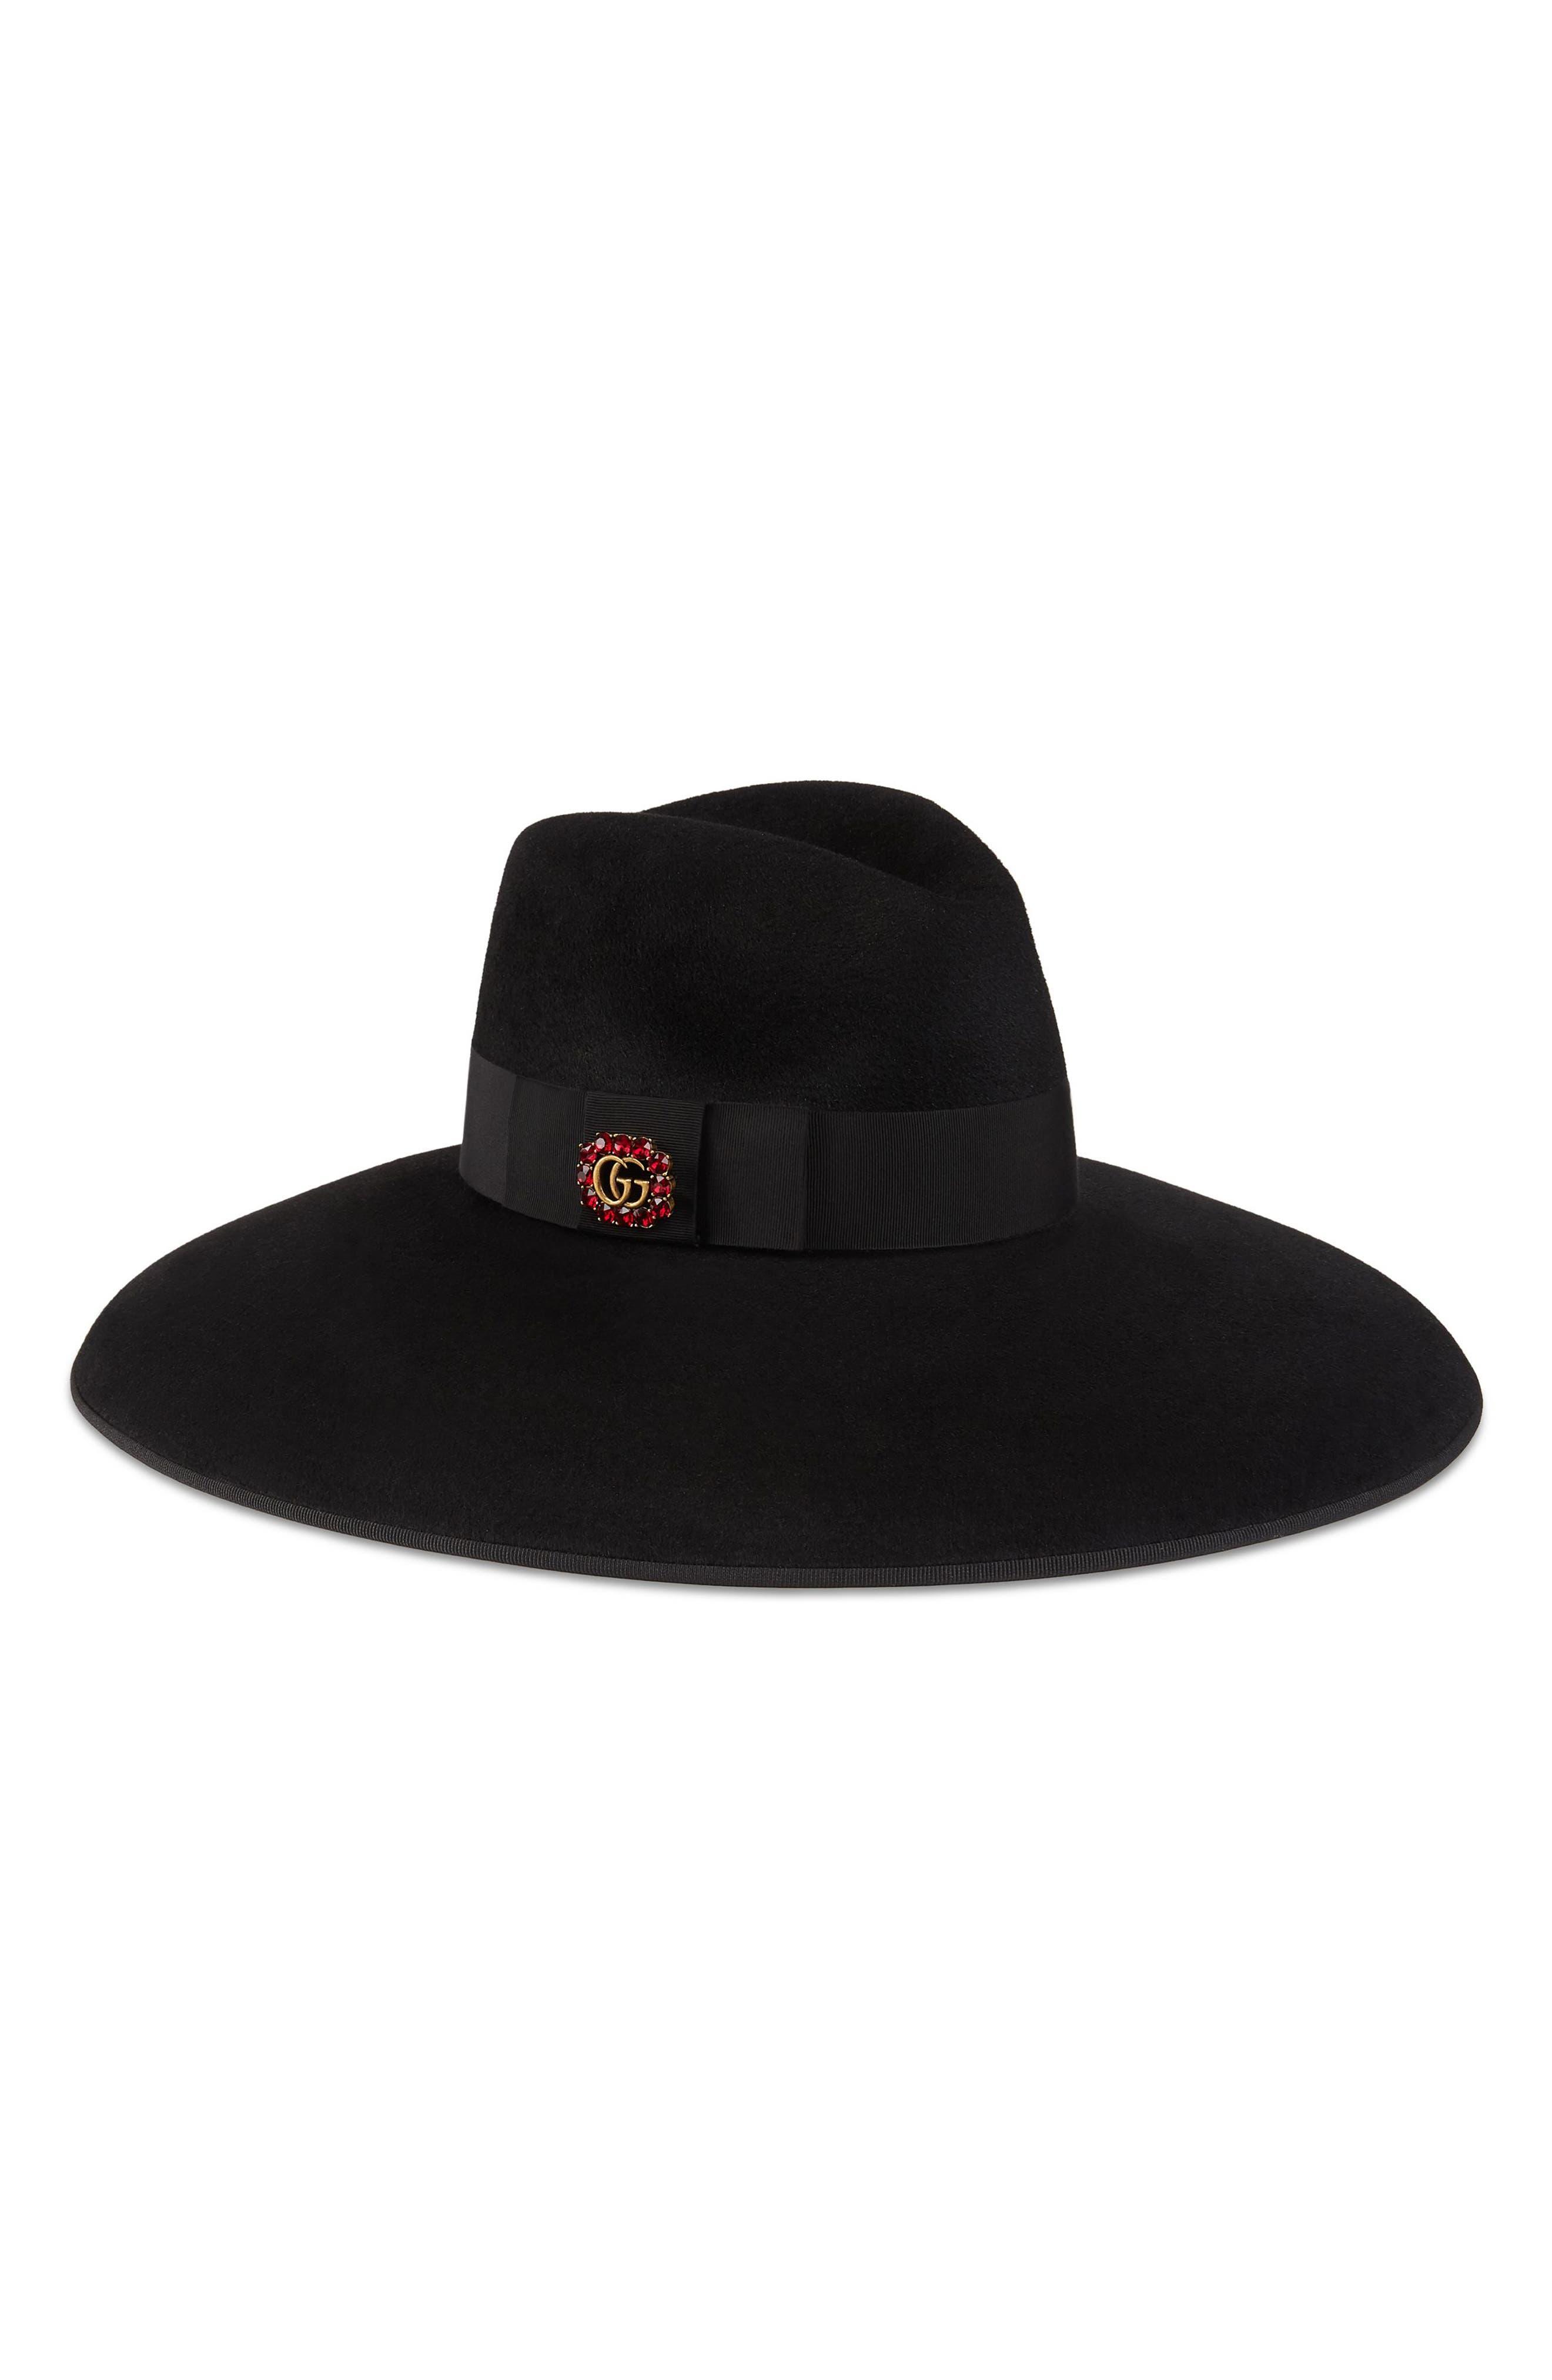 Gucci Fur Felt Wide Brim Hat